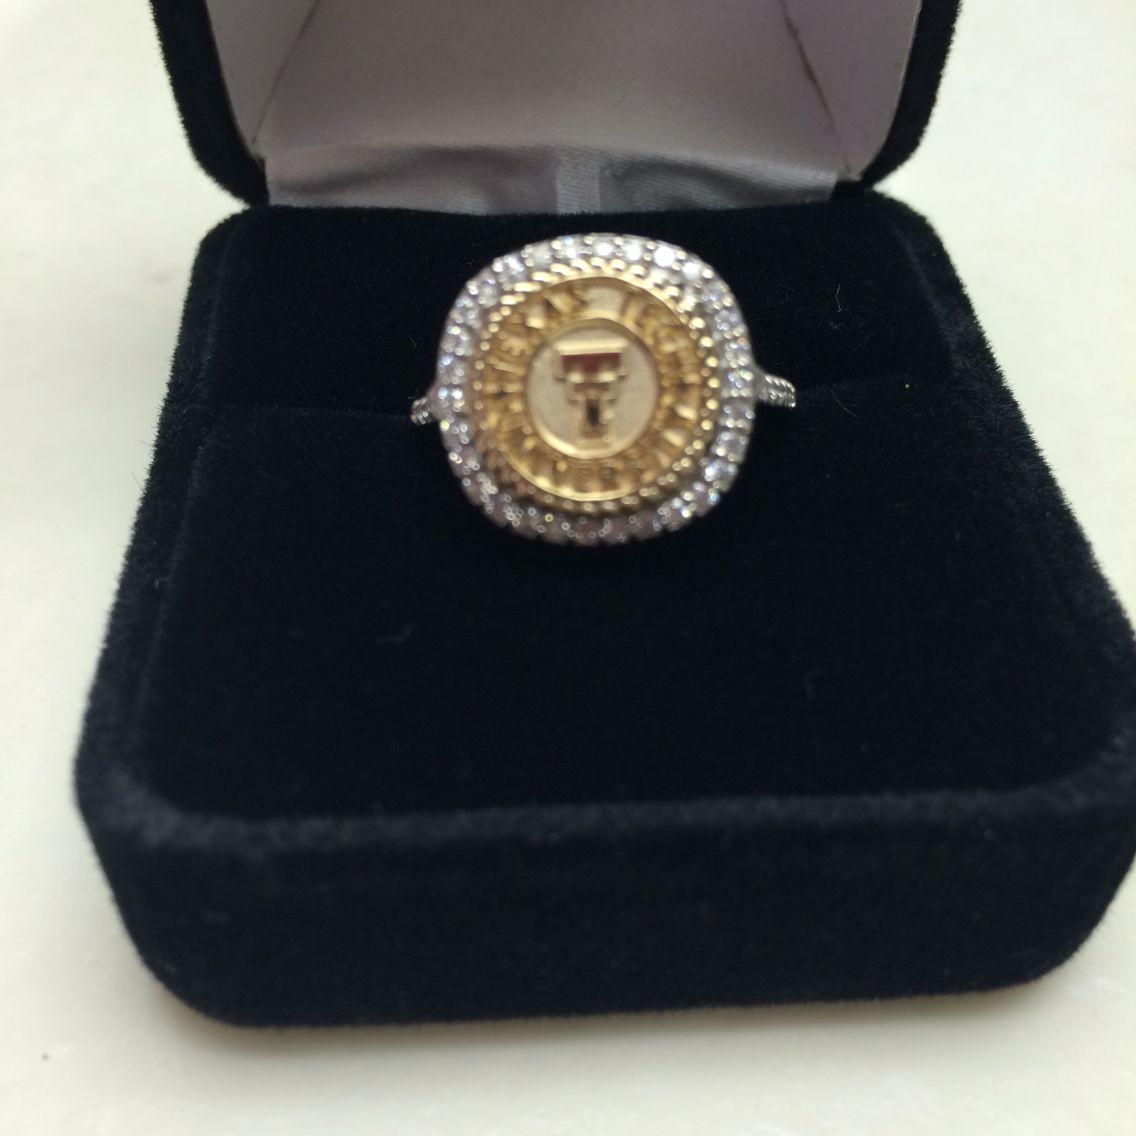 Texas Tech class ring from San Jose Jewelers.#texastech #classring